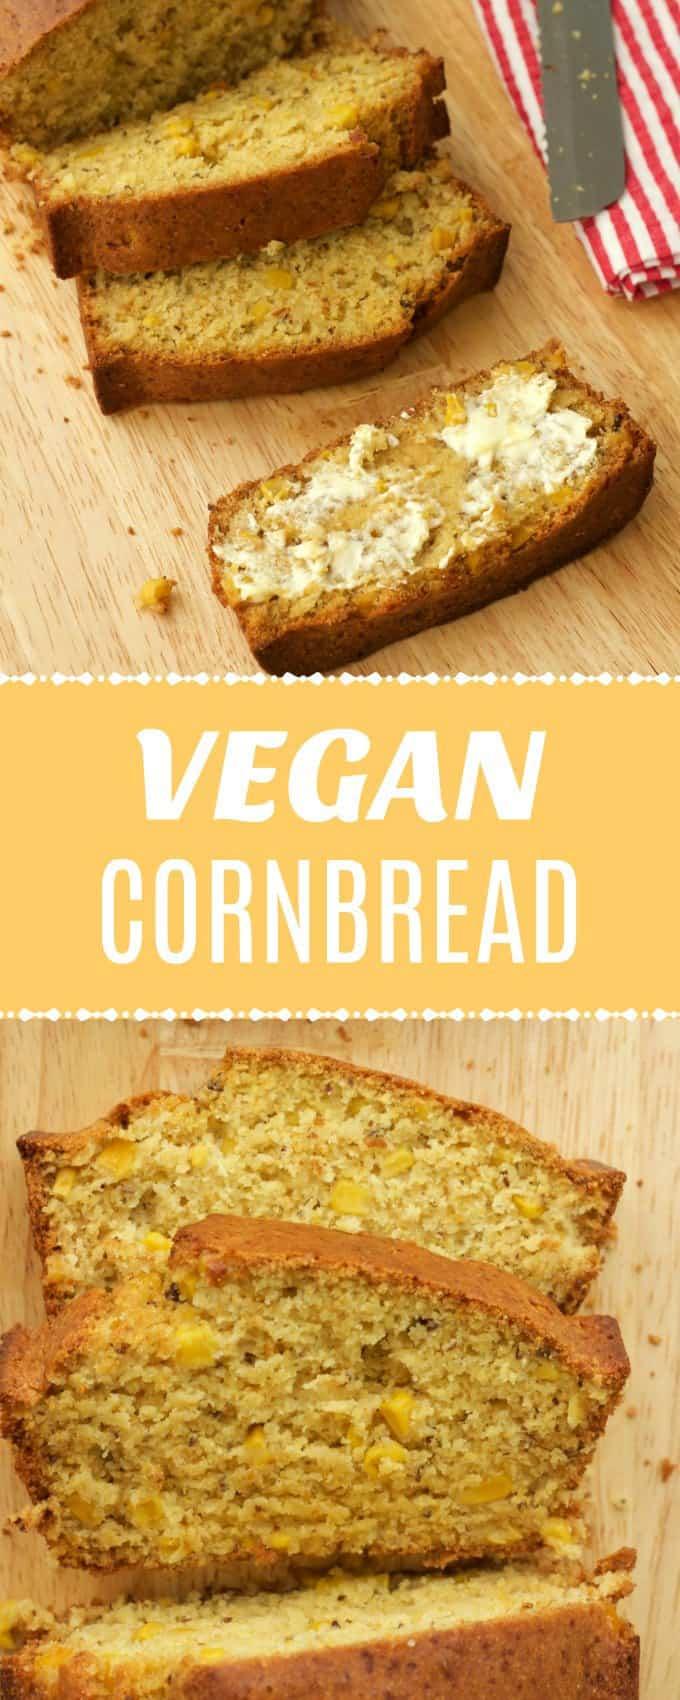 Perfectly sweet vegan cornbread with whole corn kernels. Wonderfully moist and tender and makes the perfect side dish.Ideal comfort food!  lovingitvegan.com